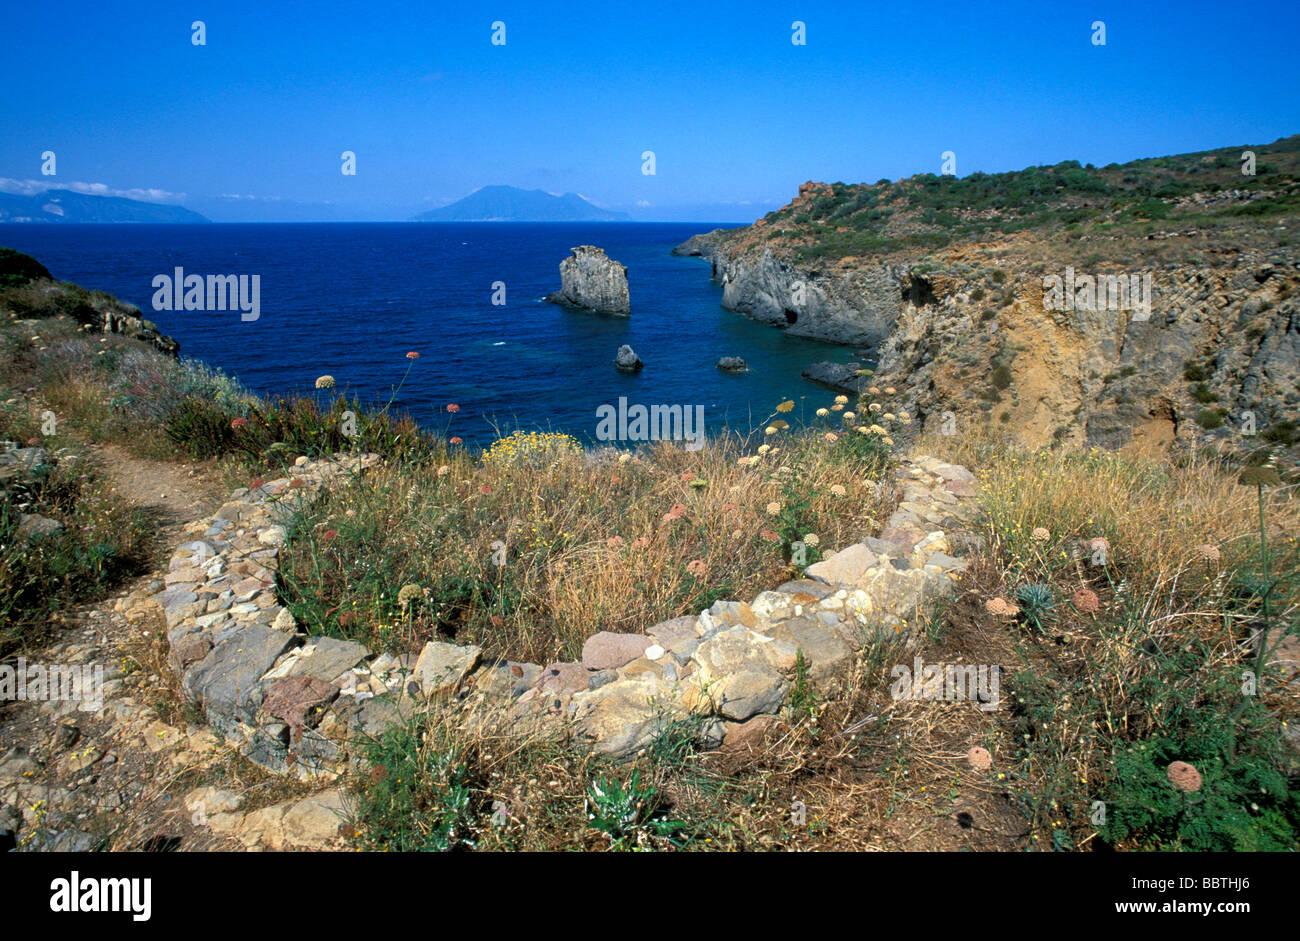 Prehistorical village, Punta Milazzese, Panarea island, Aeolian Islands, Sicily, Italy - Stock Image